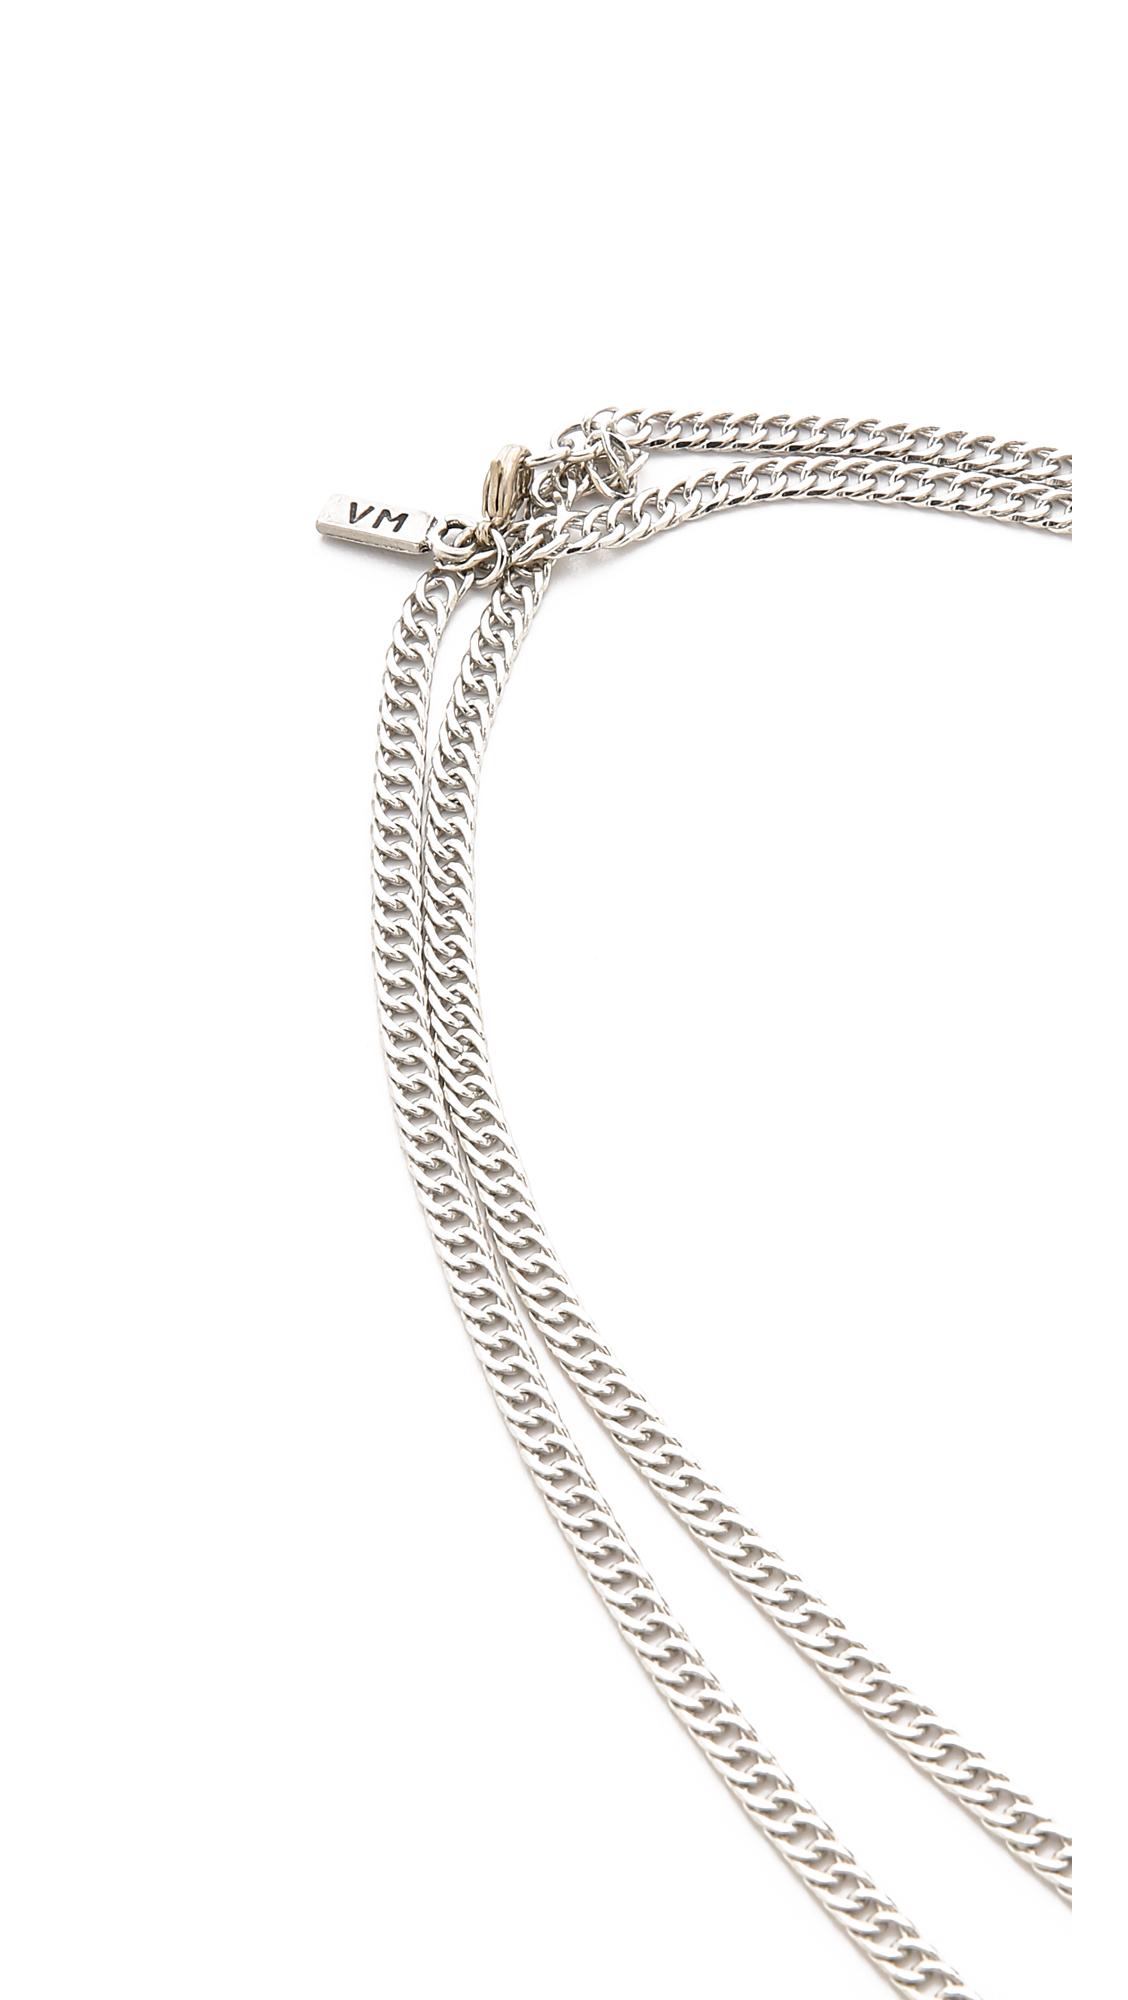 Vanessa Mooney The Novarro Tassel Necklace - Silver in Metallic